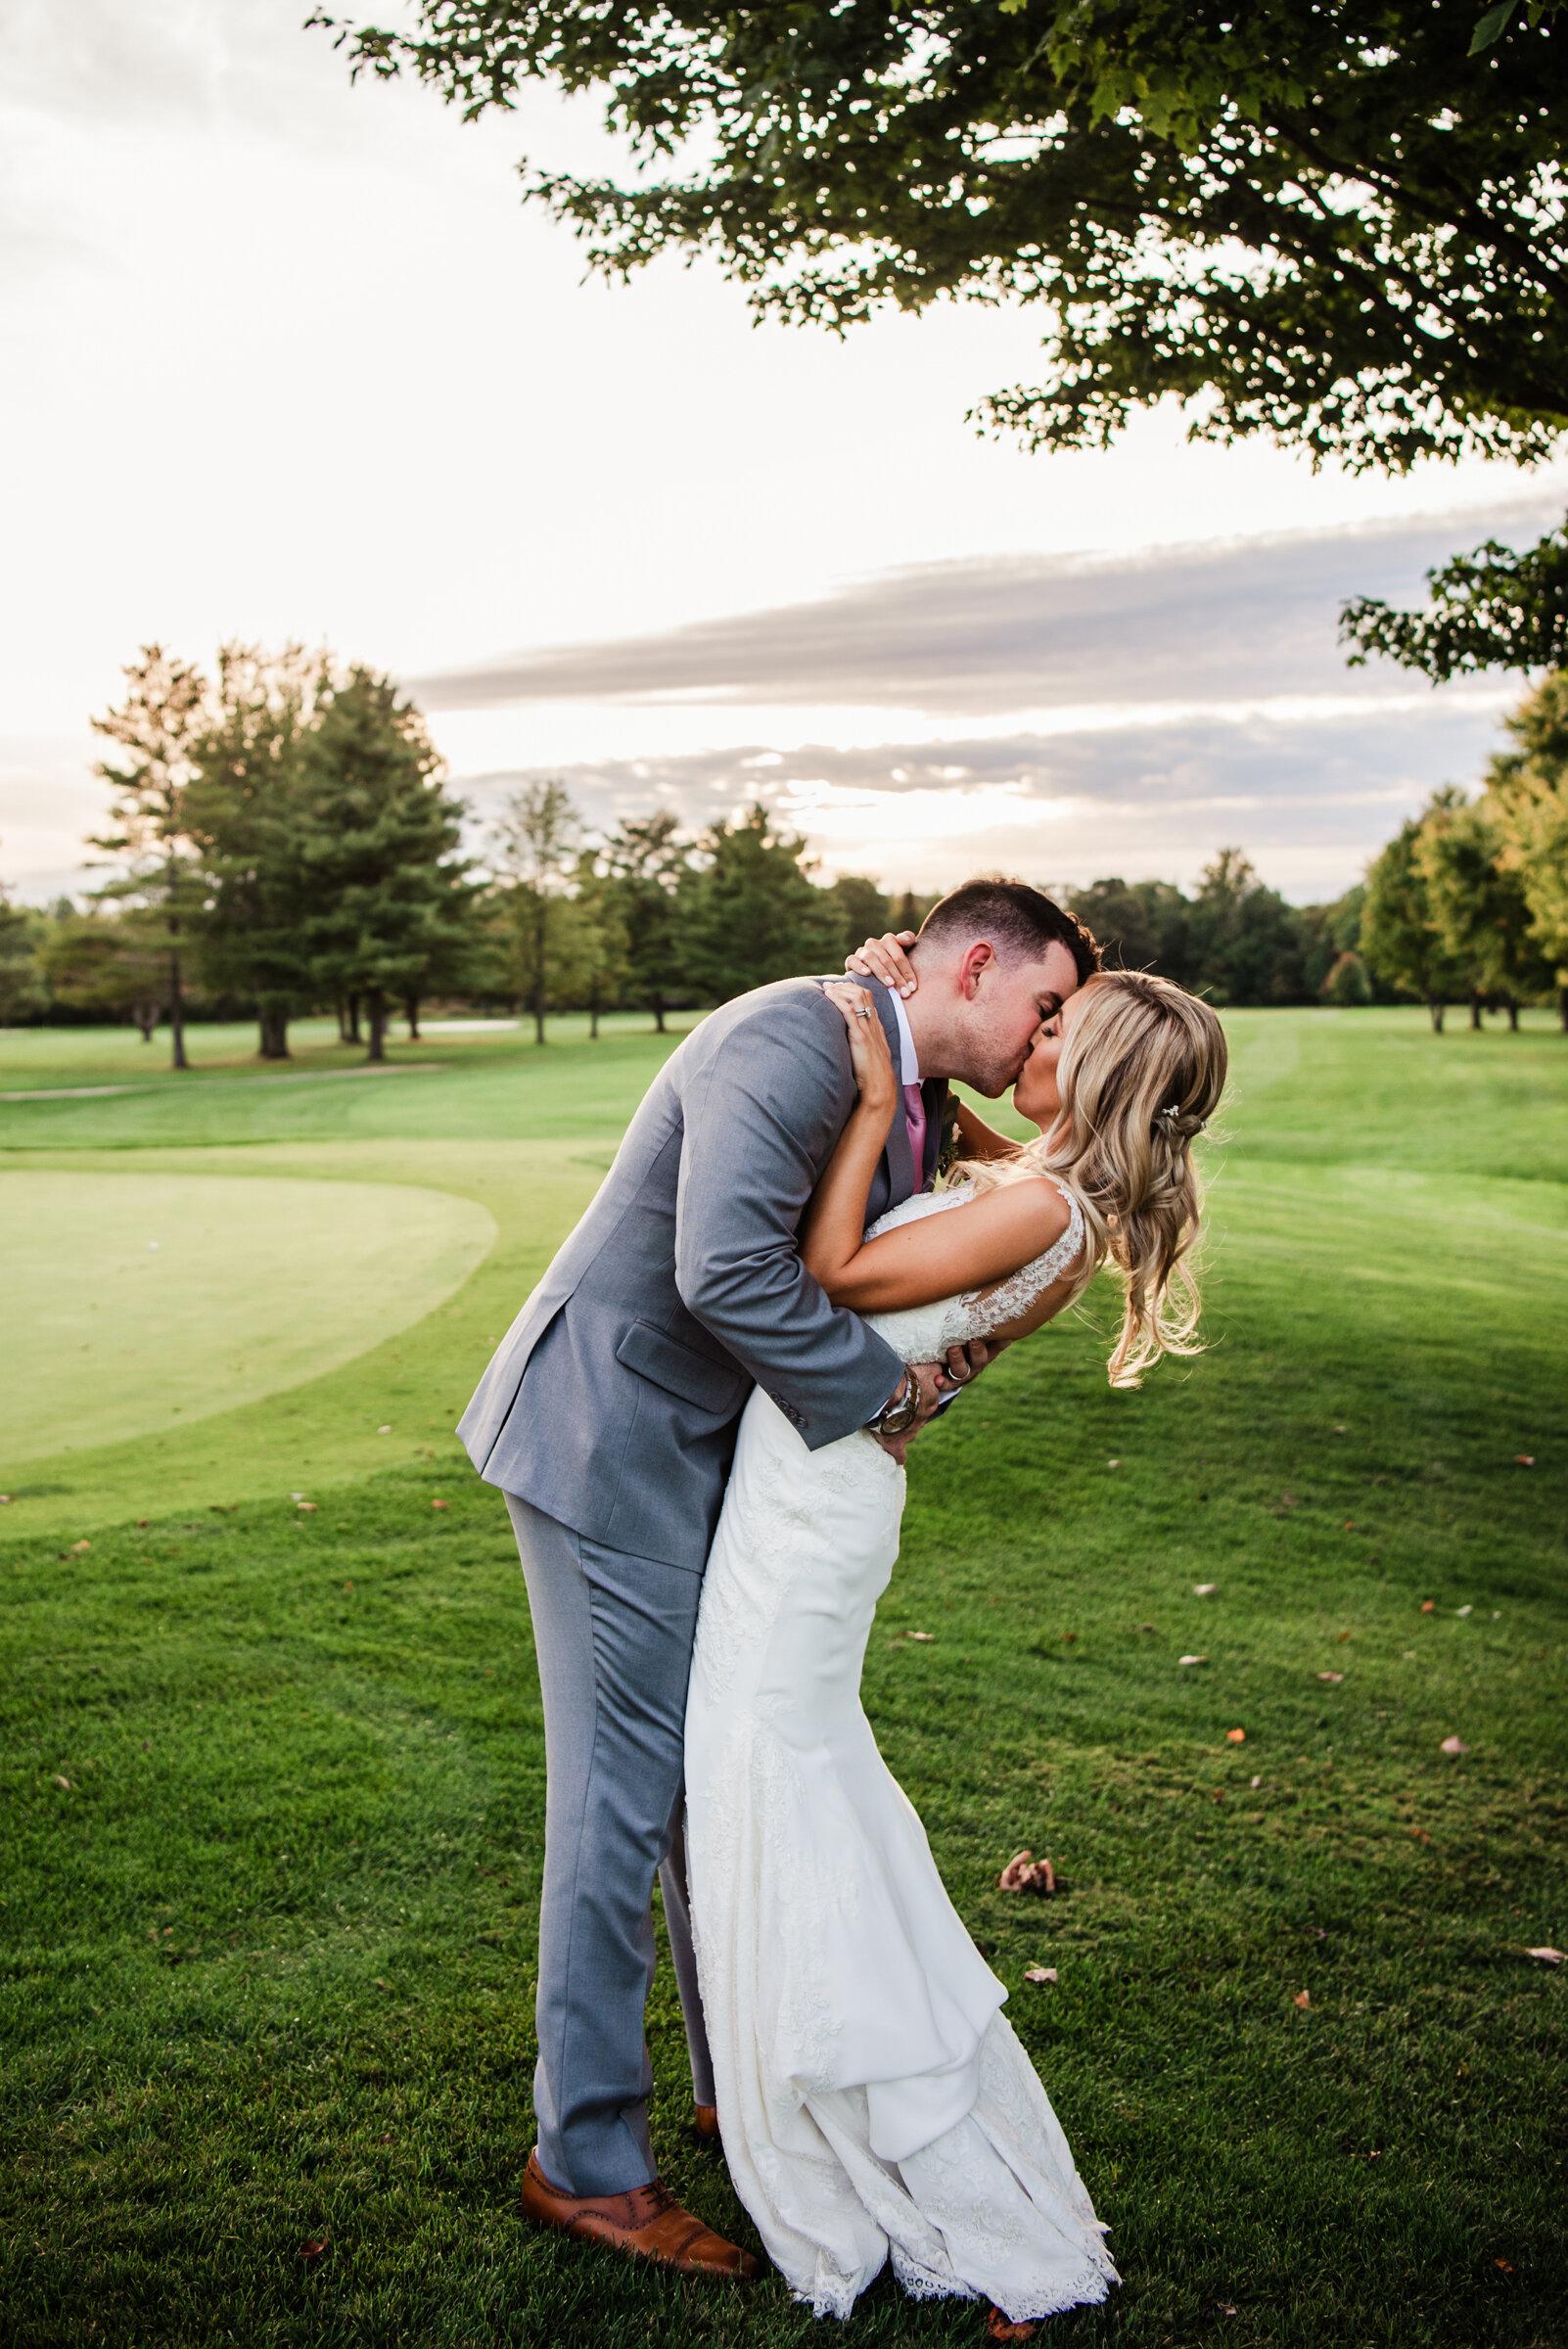 Deerfield_Country_Club_Rochester_Wedding_JILL_STUDIO_Rochester_NY_Photographer_DSC_6932.jpg